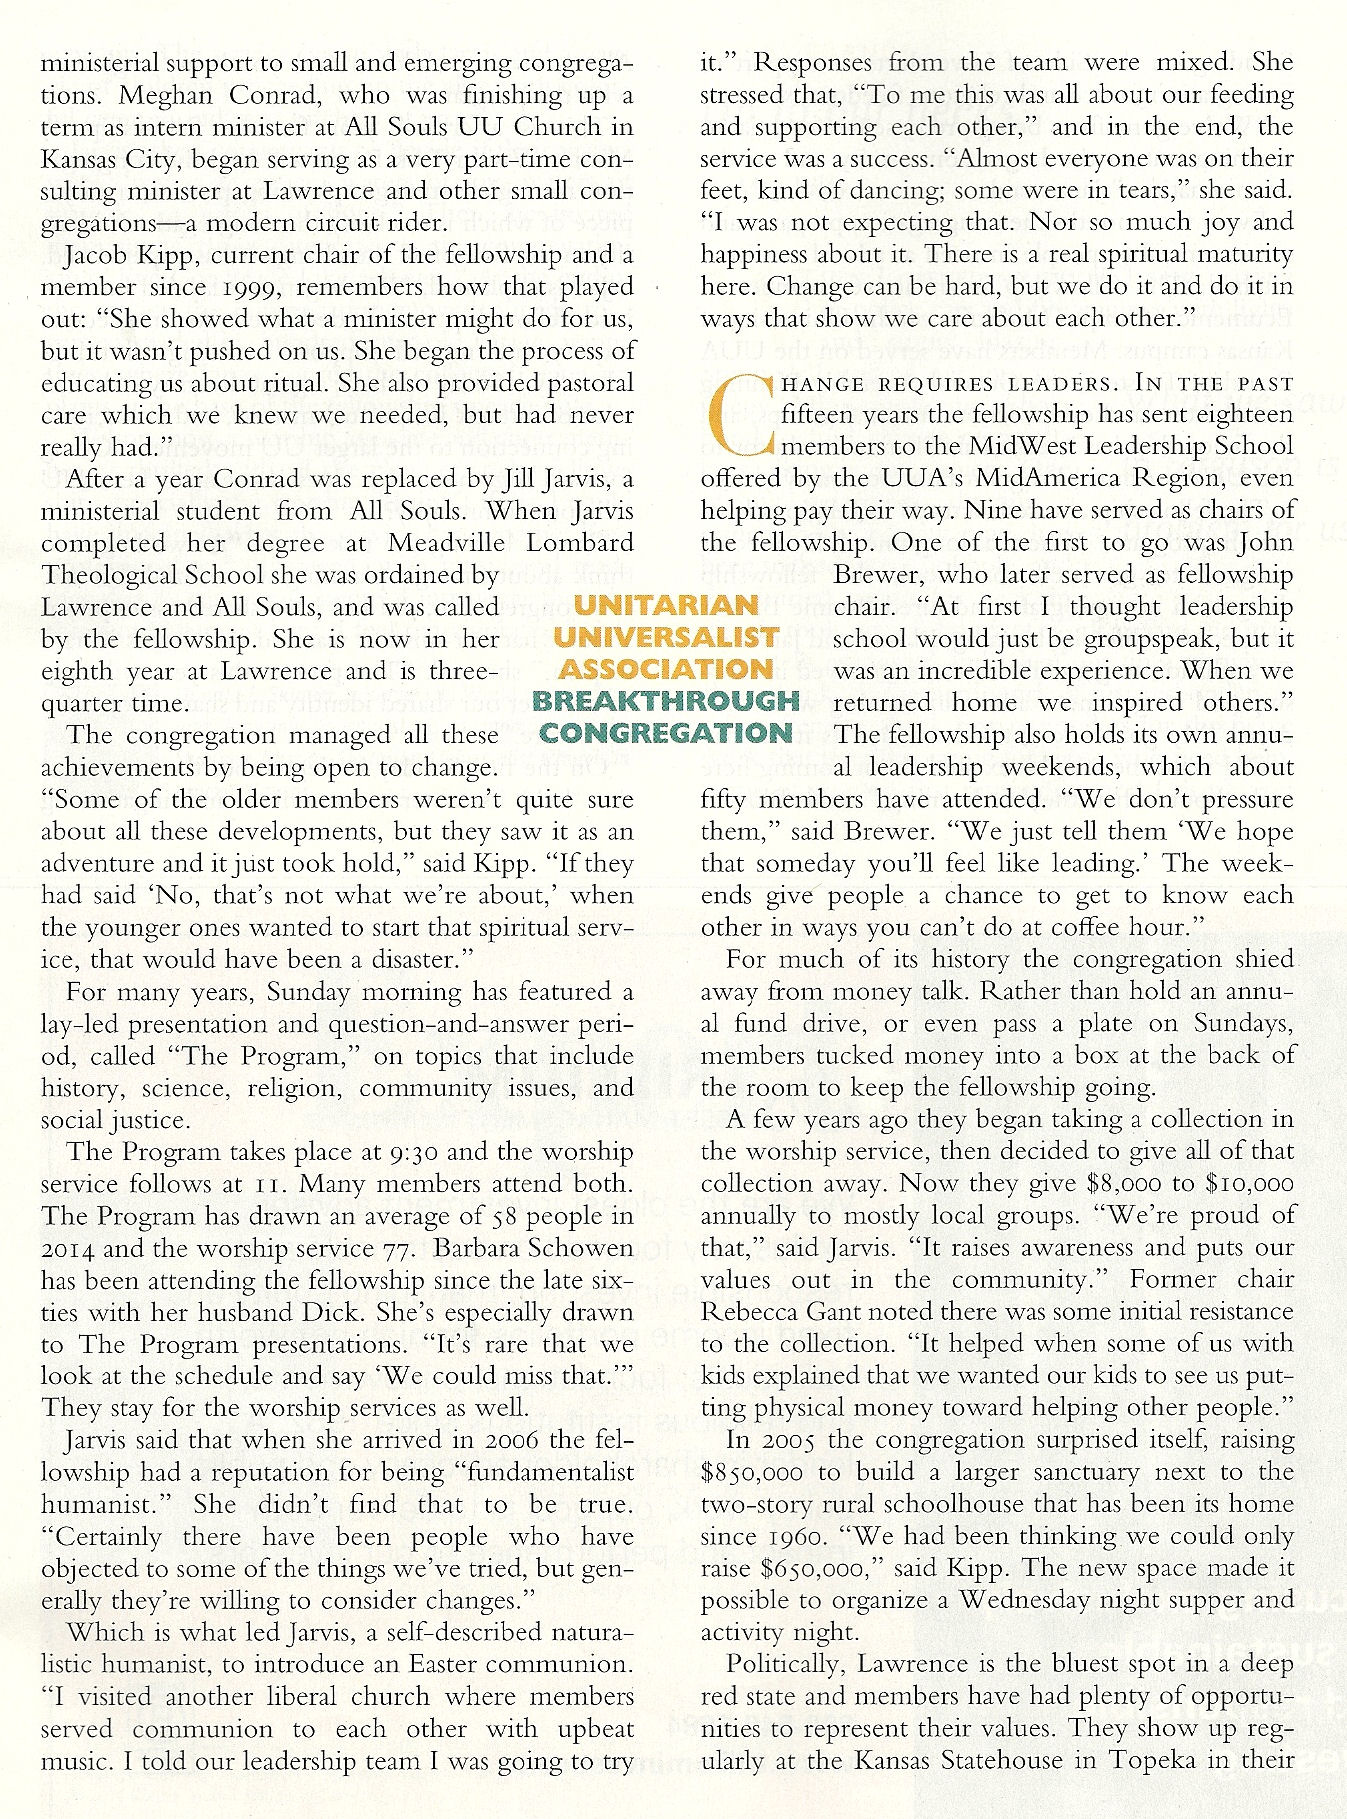 Breakthrough article 3